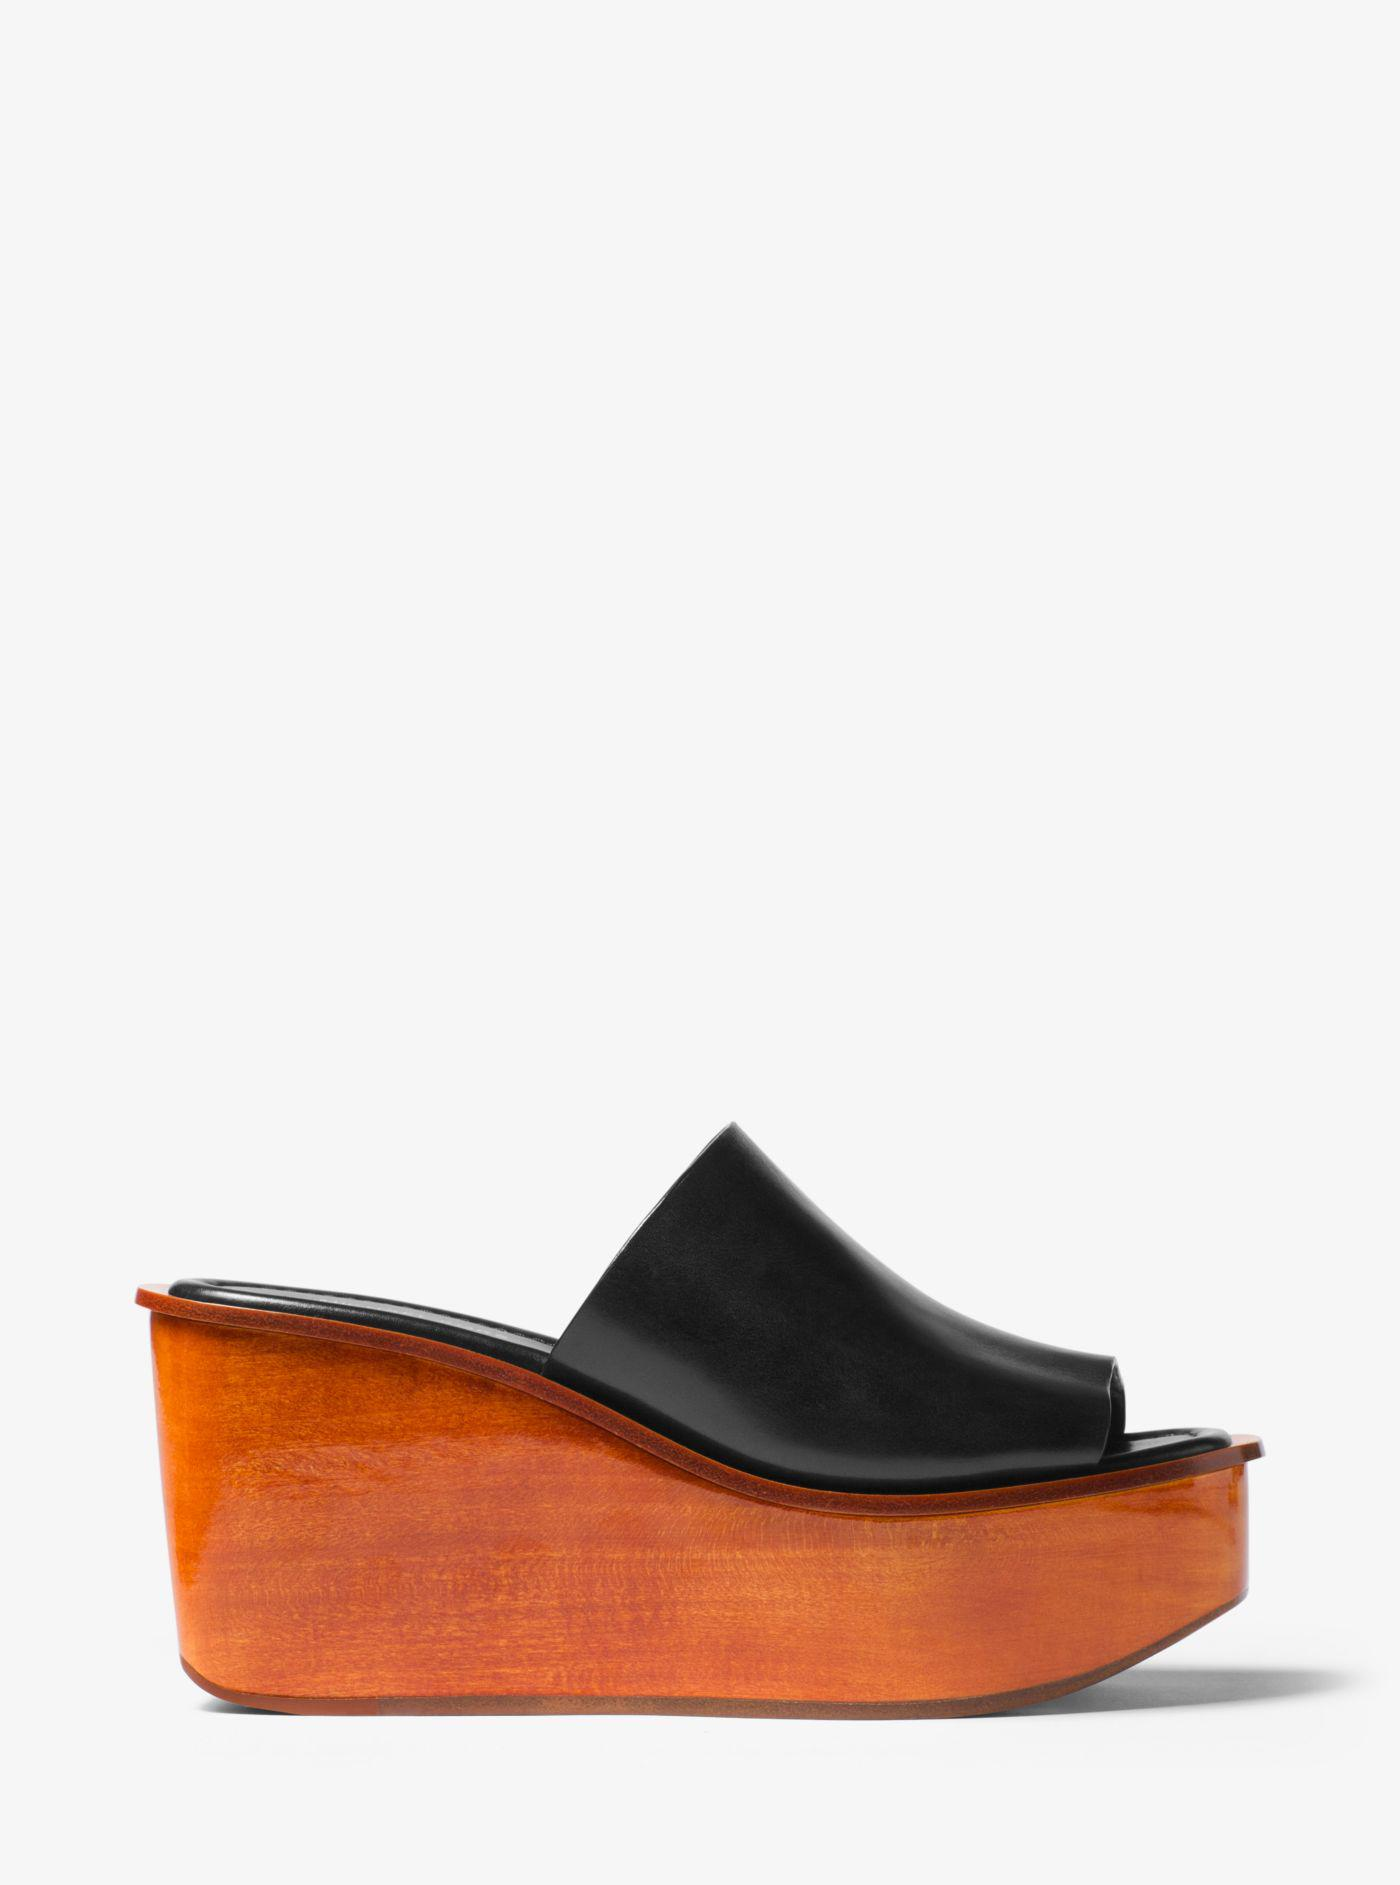 ca38371ceab4 Browns Shoes Michael Kors Boots - Style Guru  Fashion